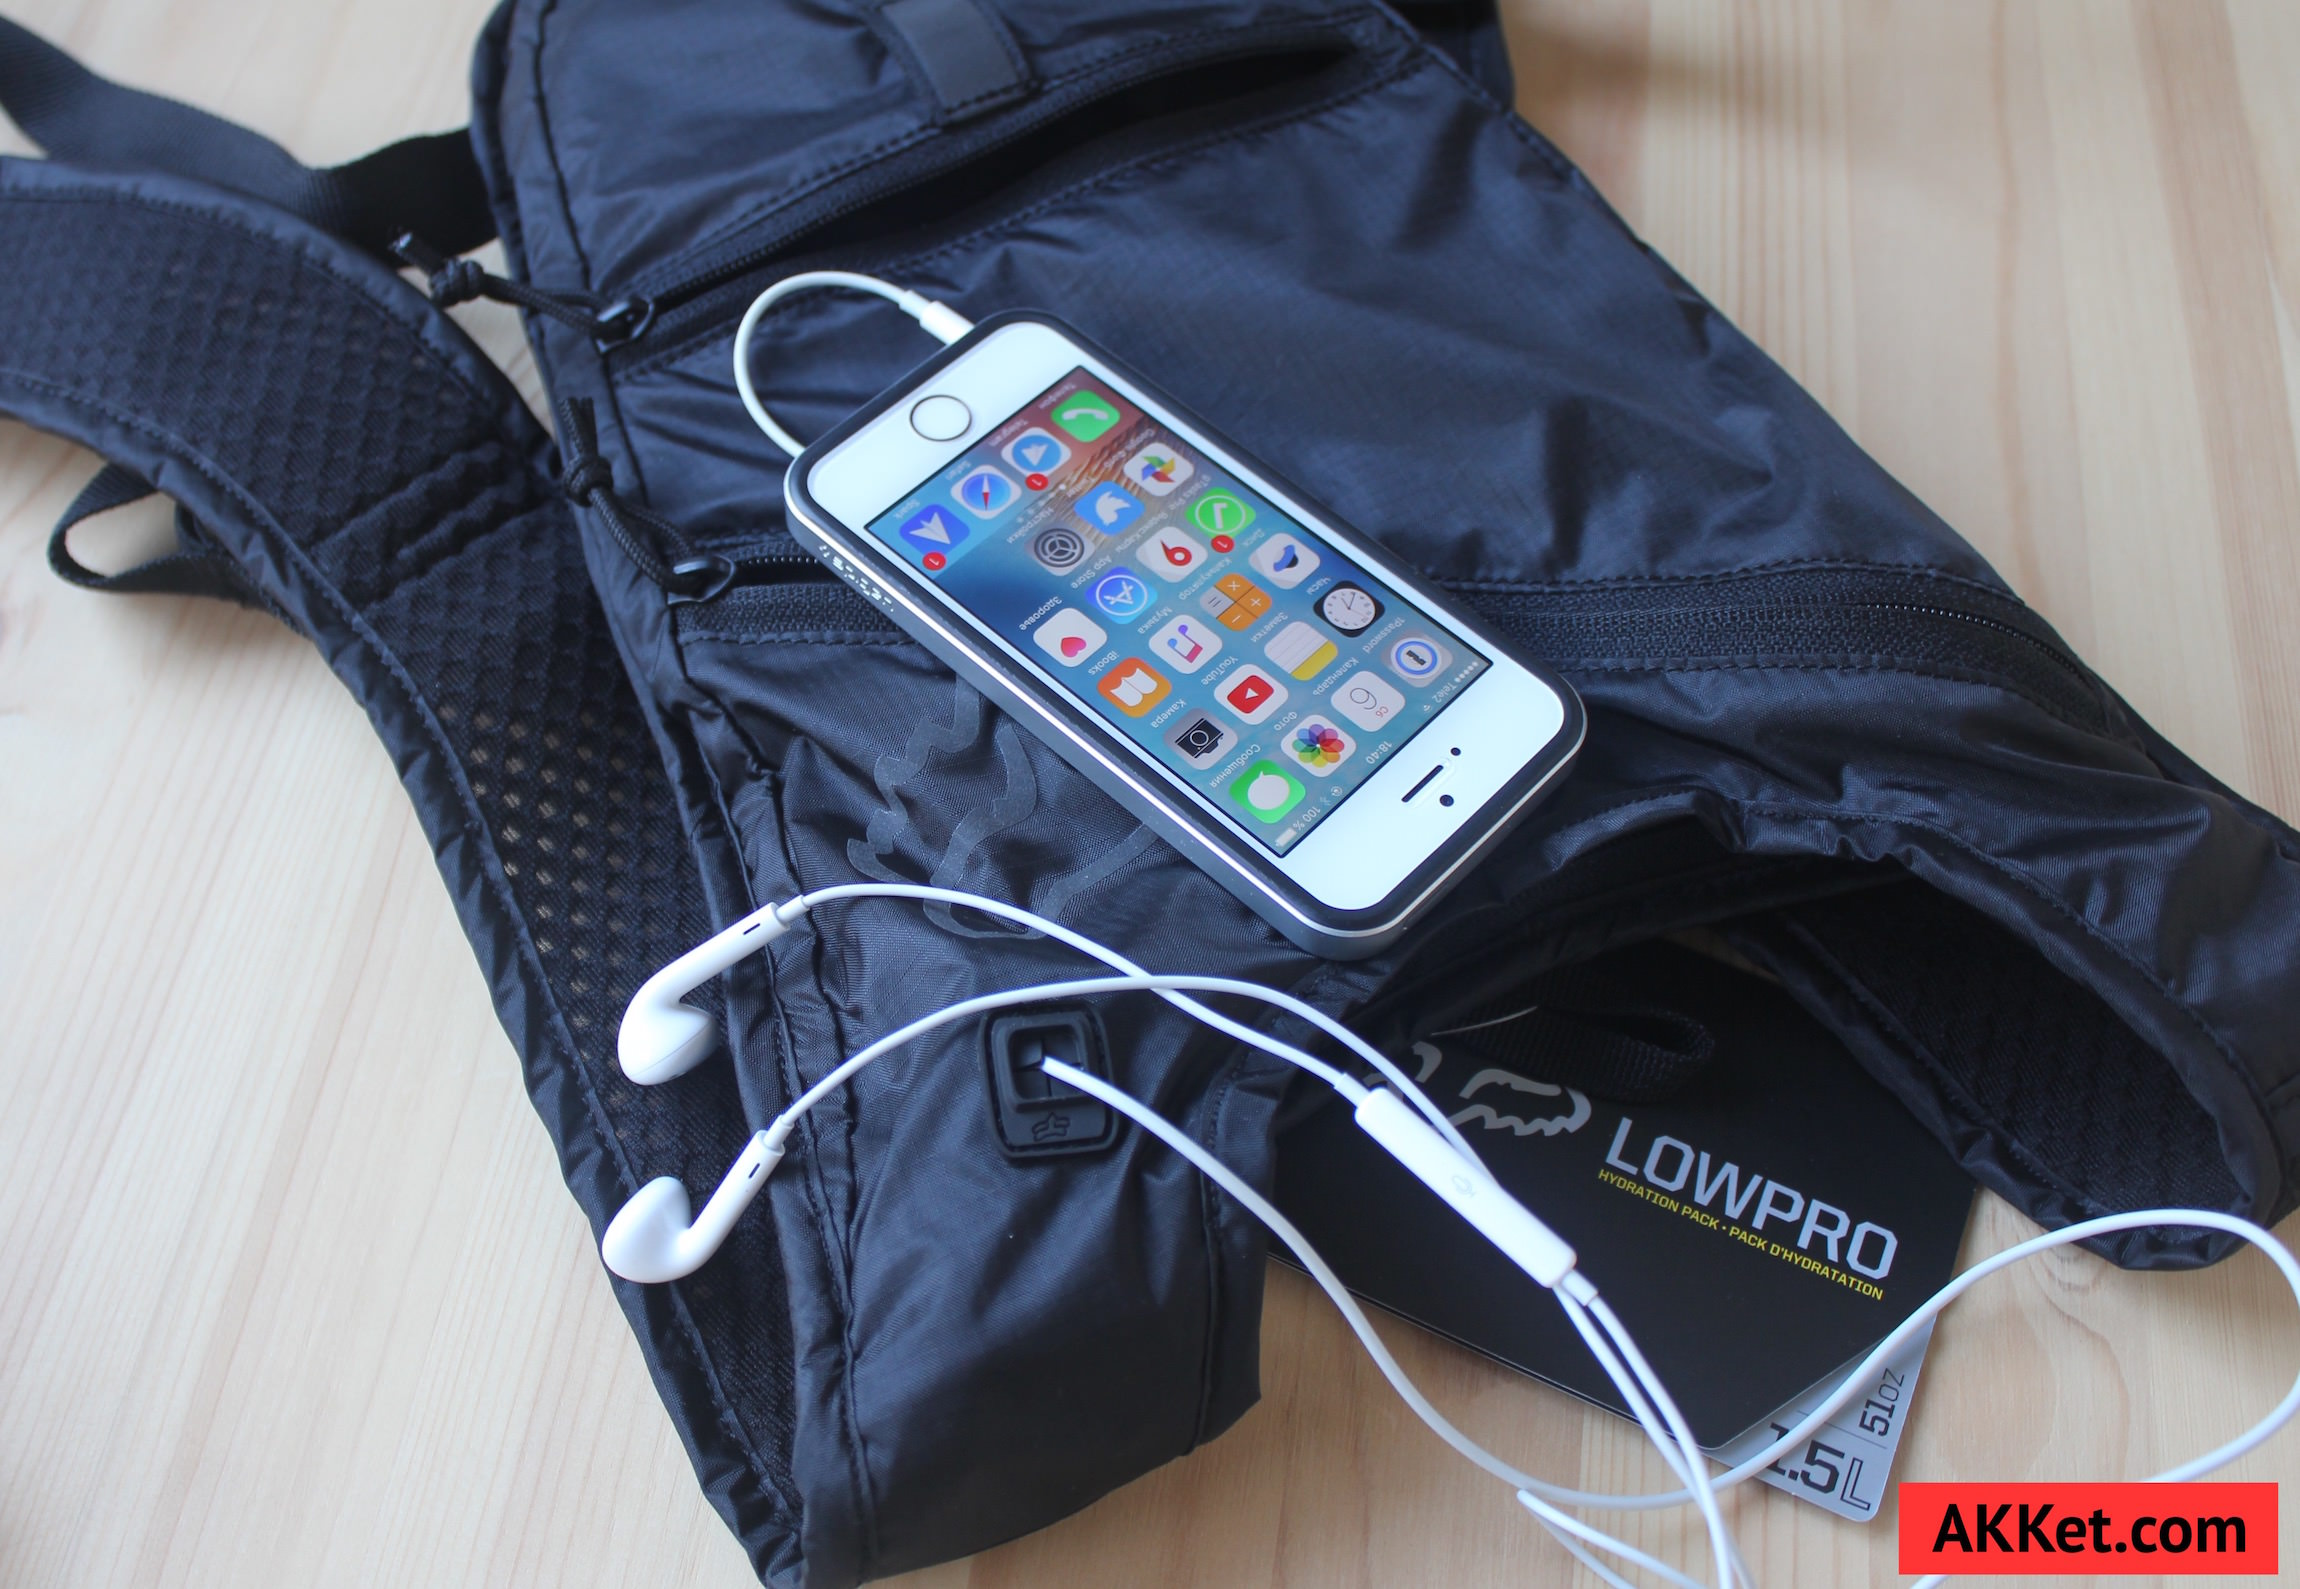 Fox Low Pro backpack iPad mini iPhone 9